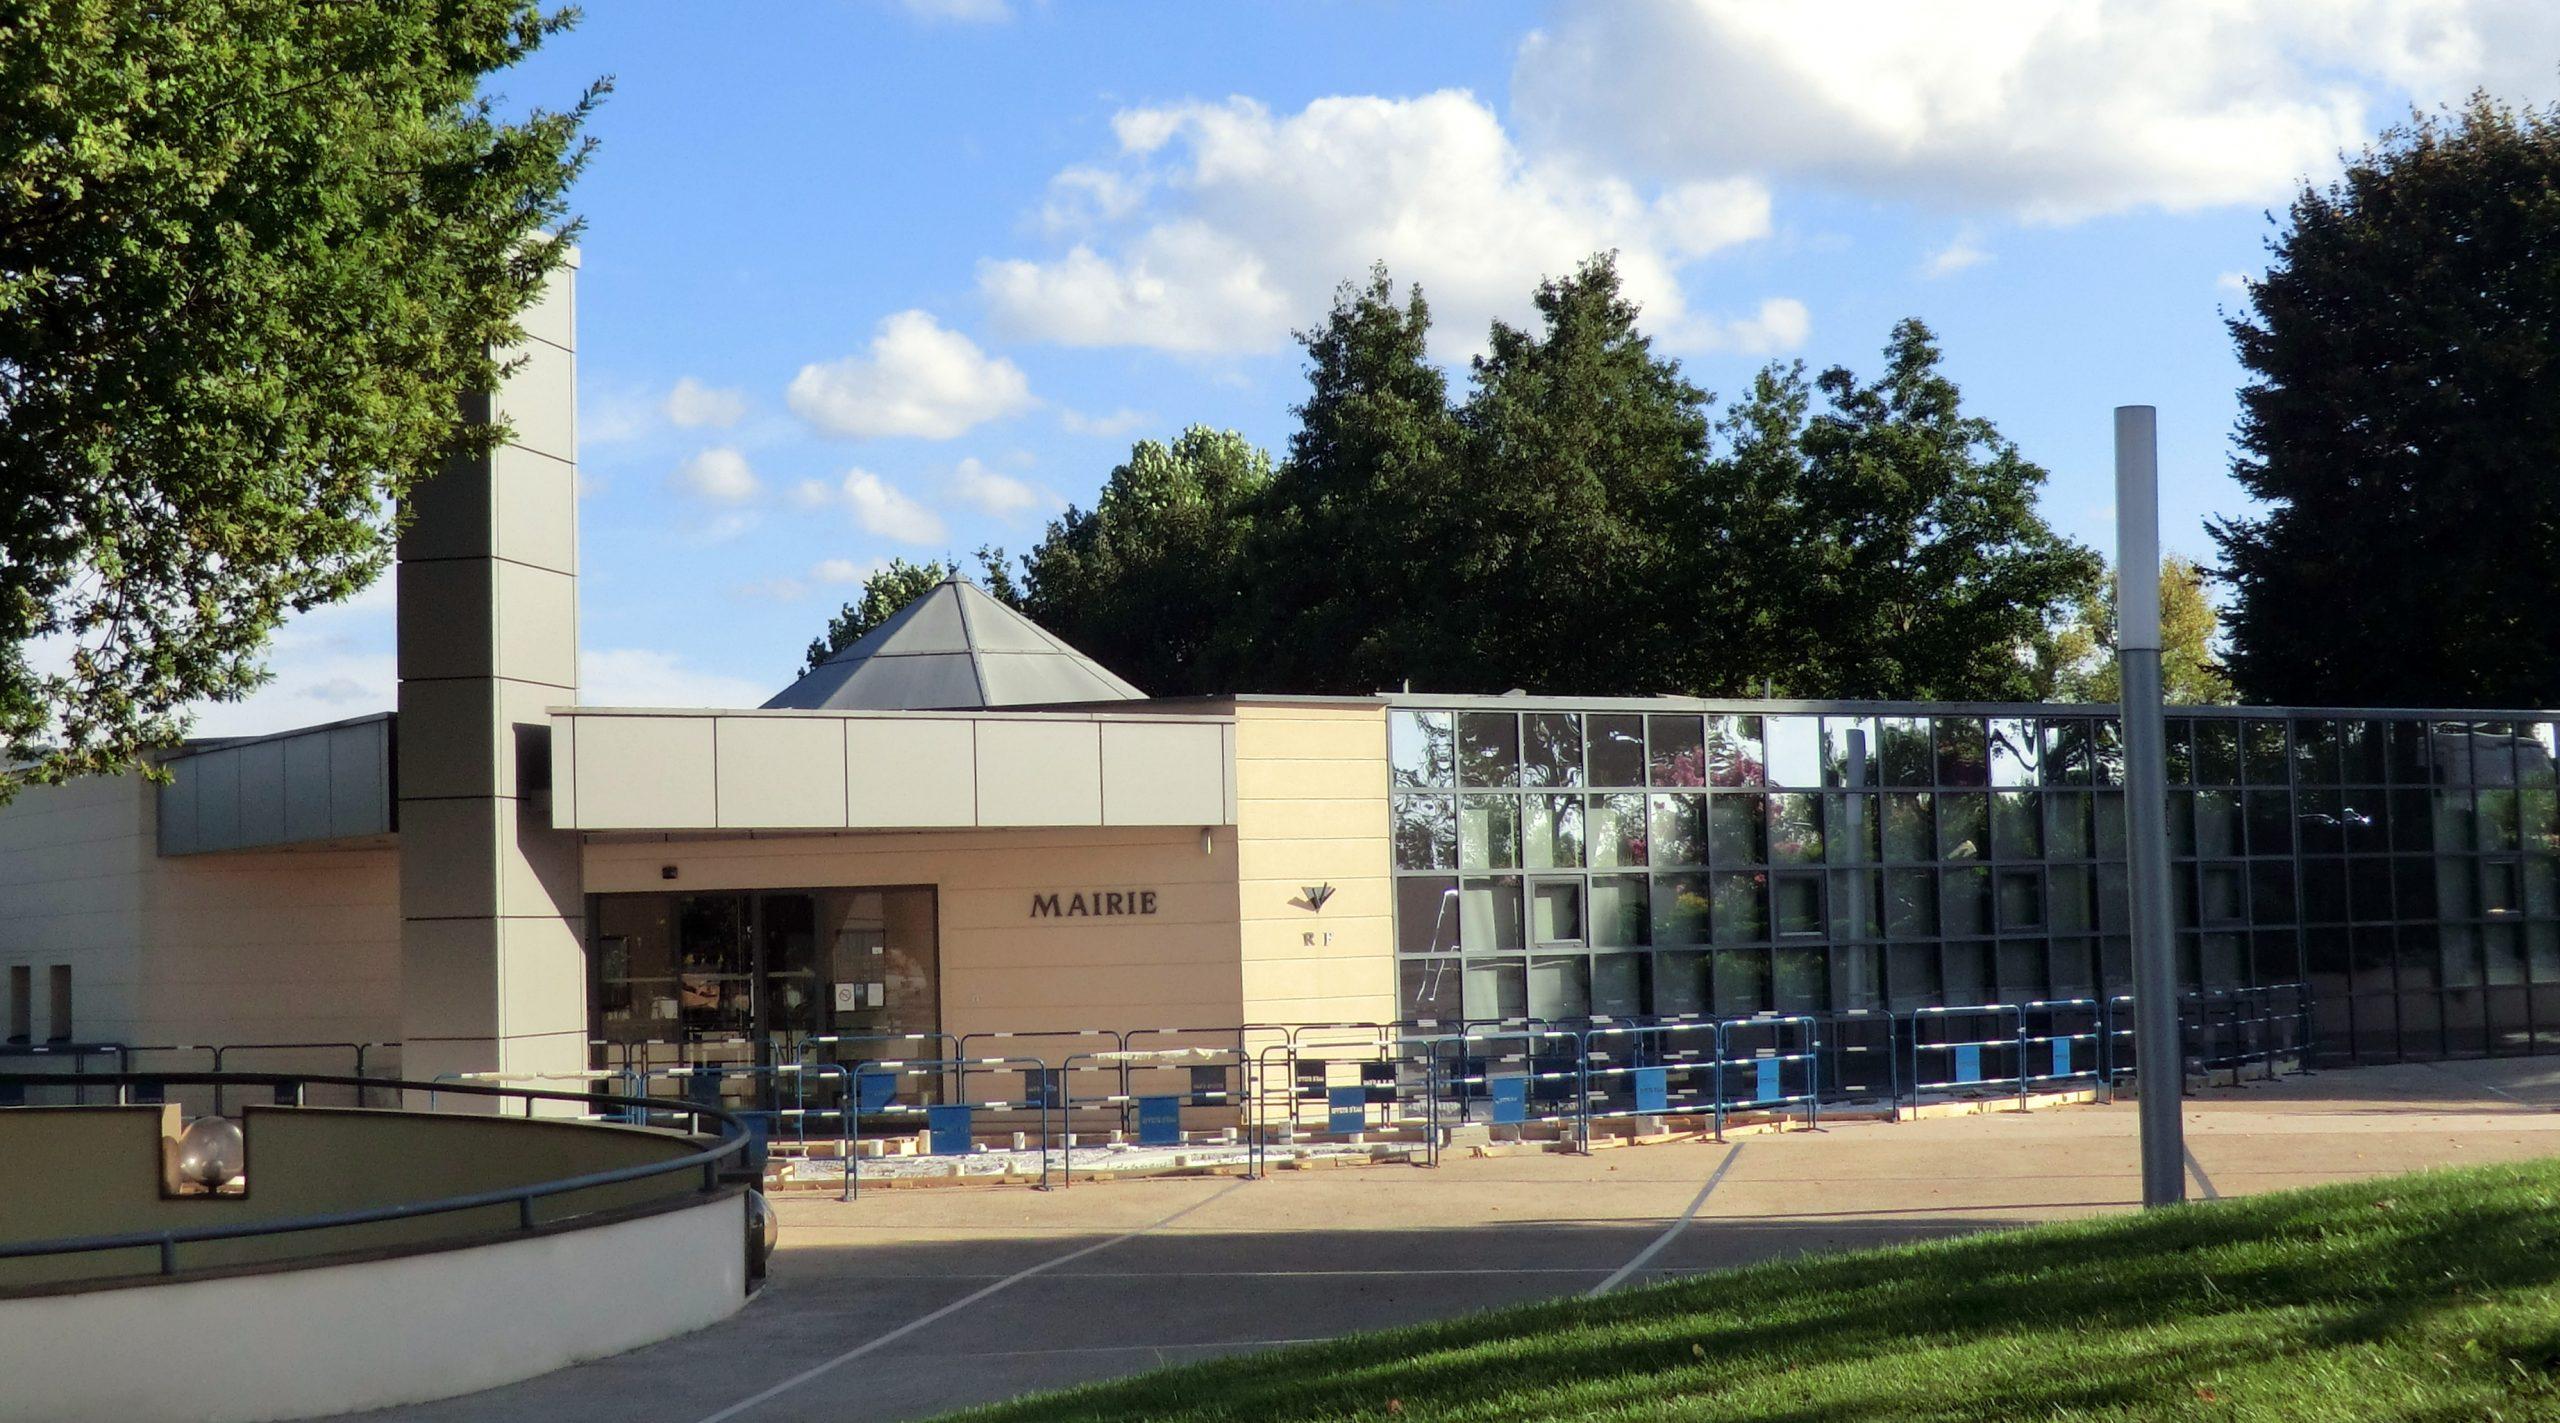 Saint-Vulbas — Wikipédia encequiconcerne St Vulbas Piscine